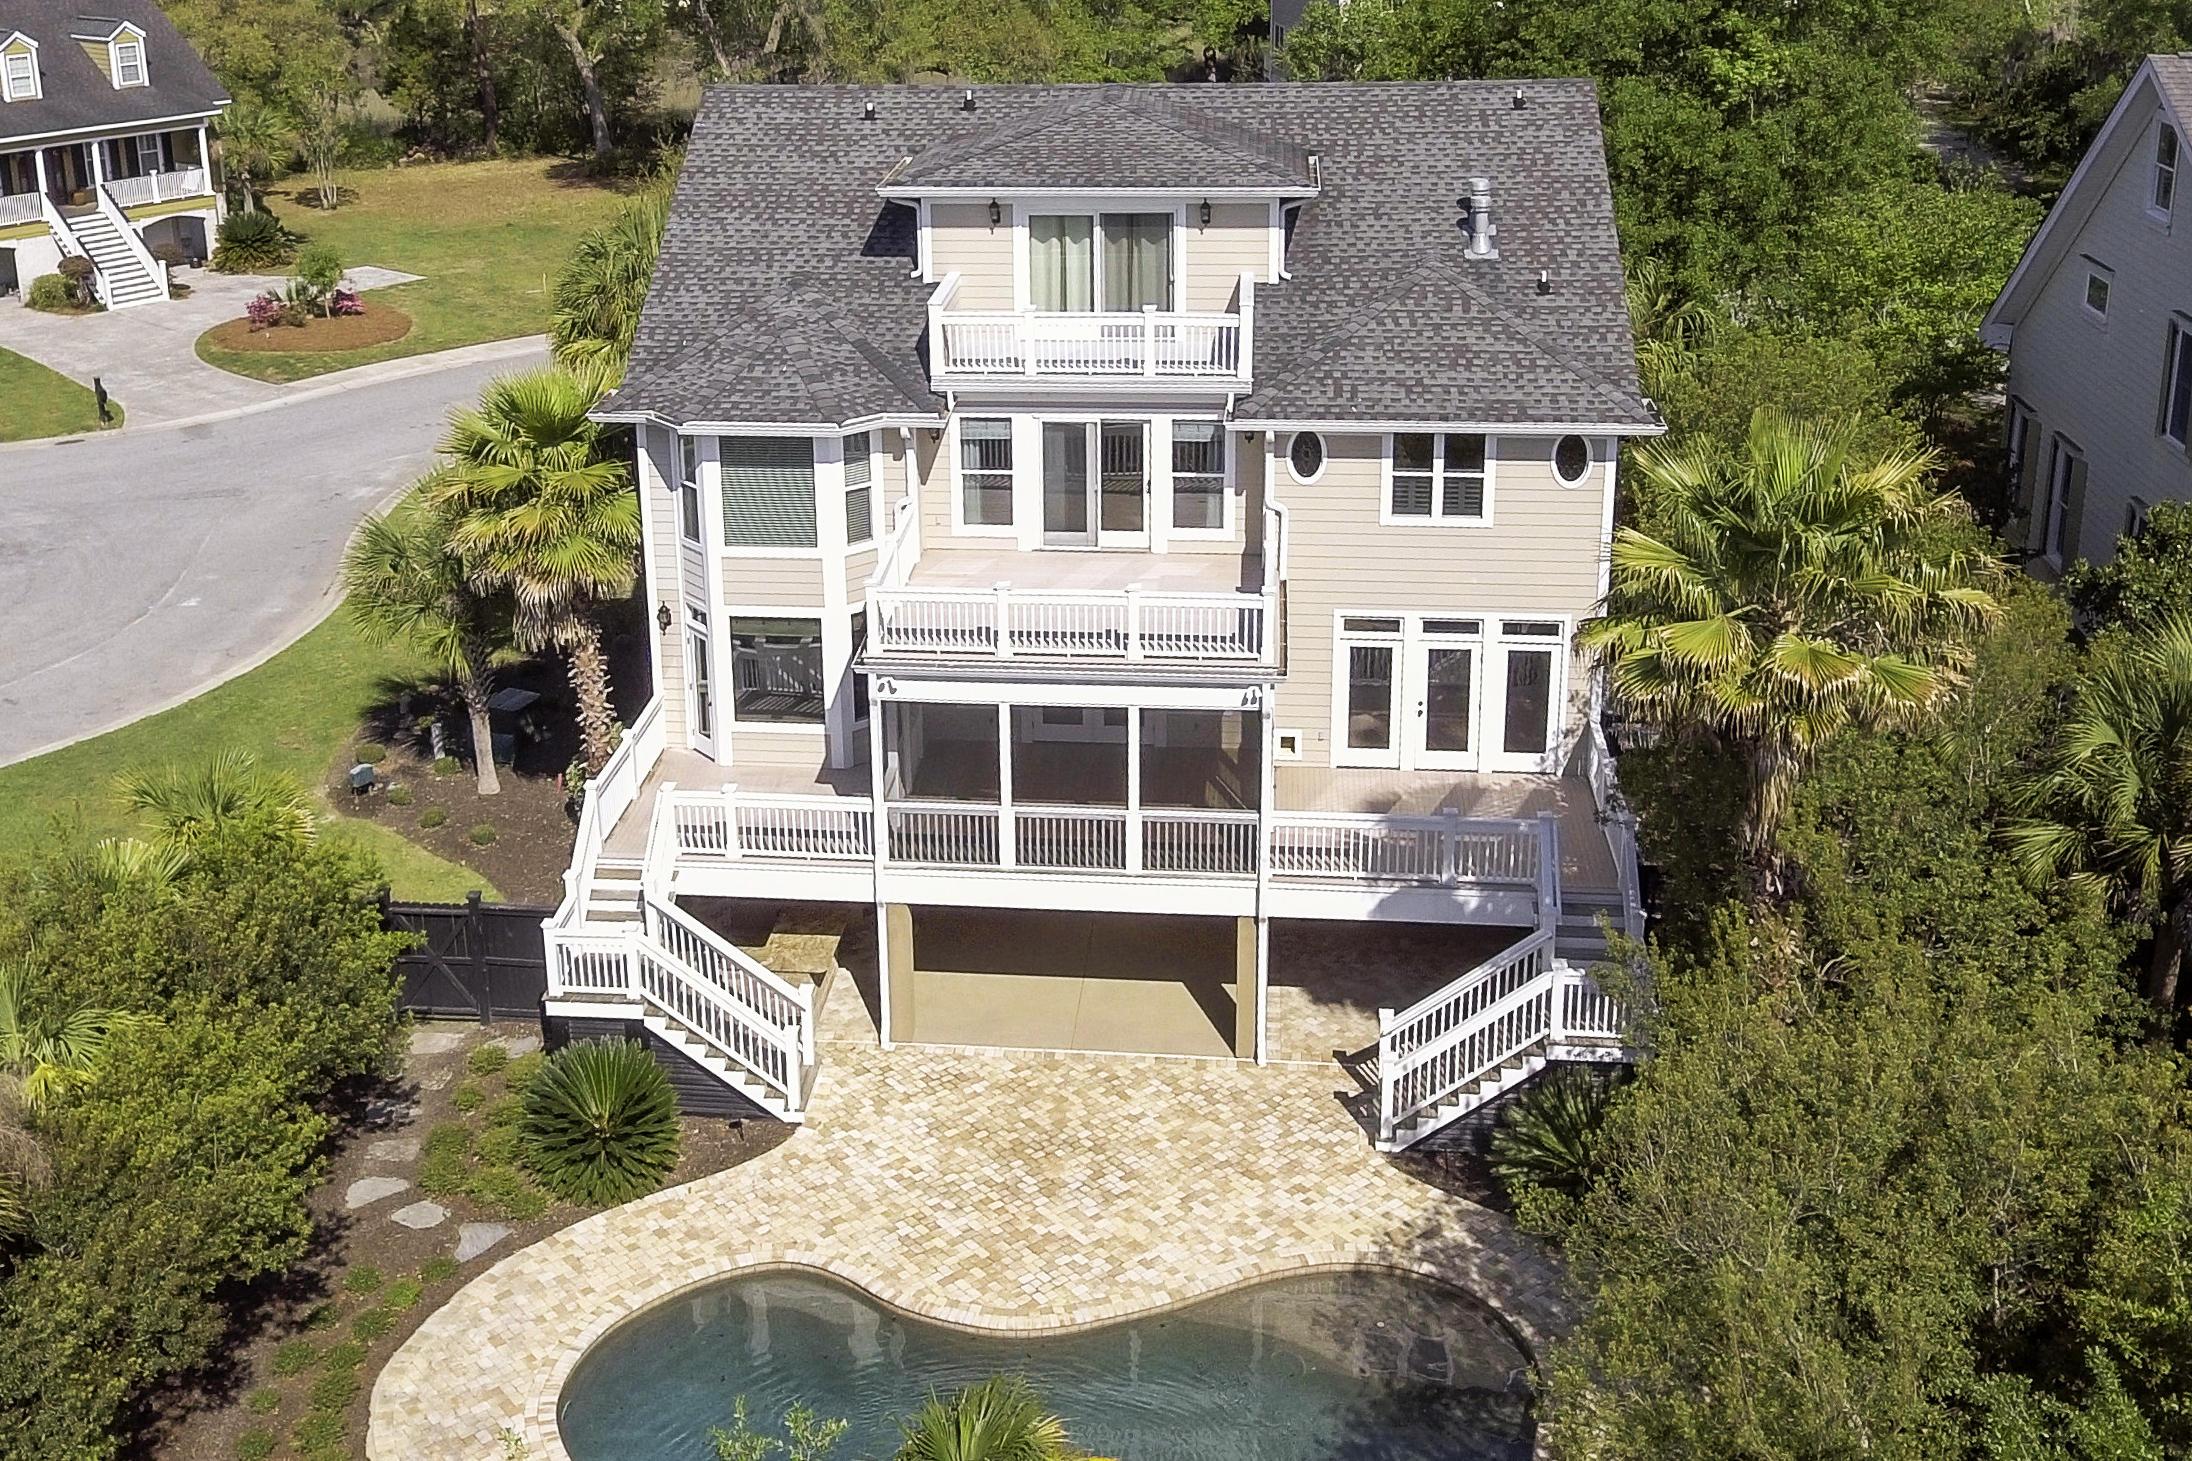 Bull Creek Peninsula Homes For Sale - 1635 Bull Creek, Charleston, SC - 13